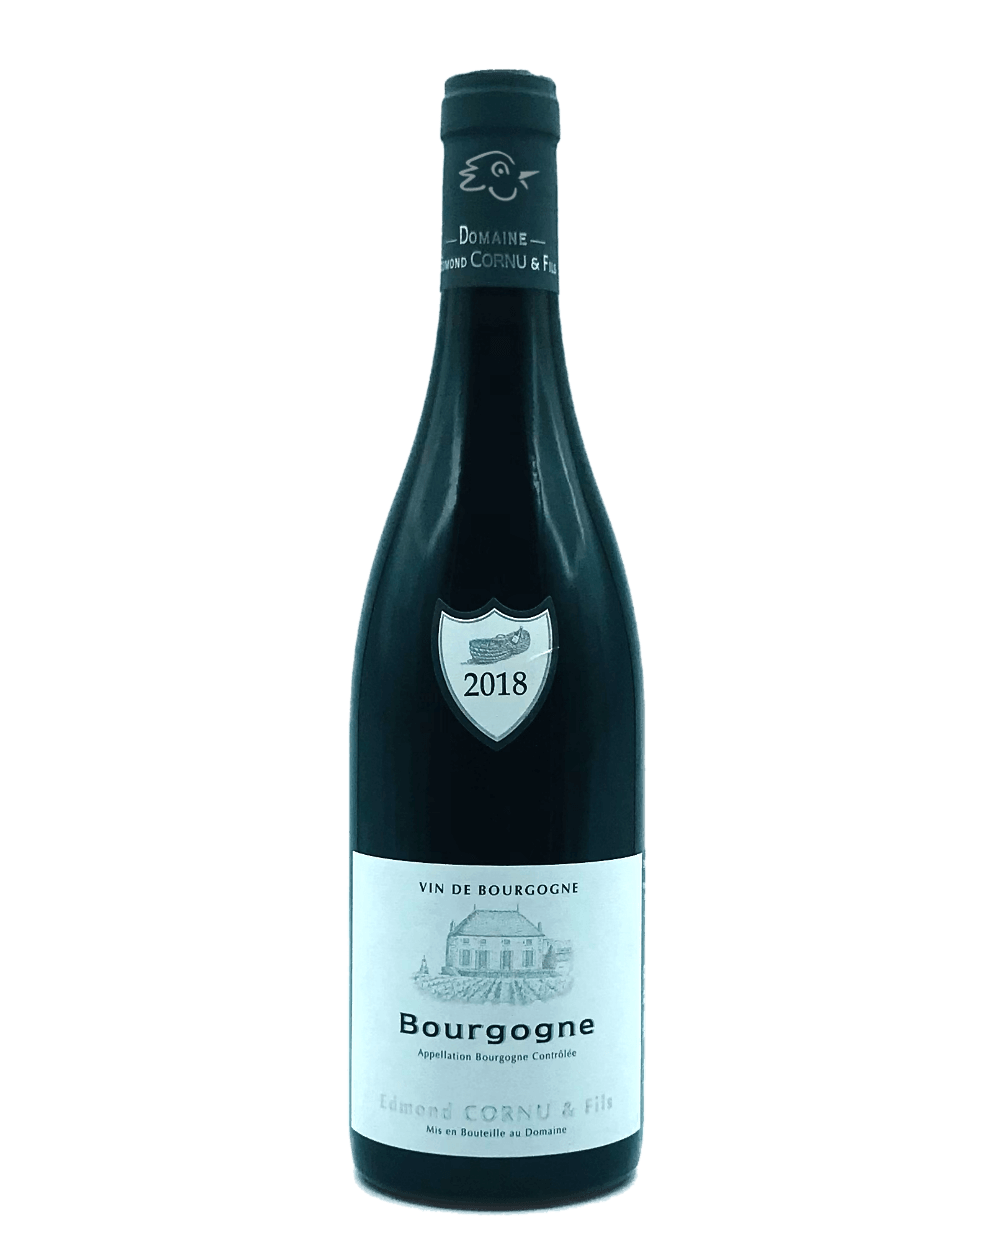 Domaine Edmond Cornu & Fils - Bourgogne Pinot Noir 2018 - Avintures